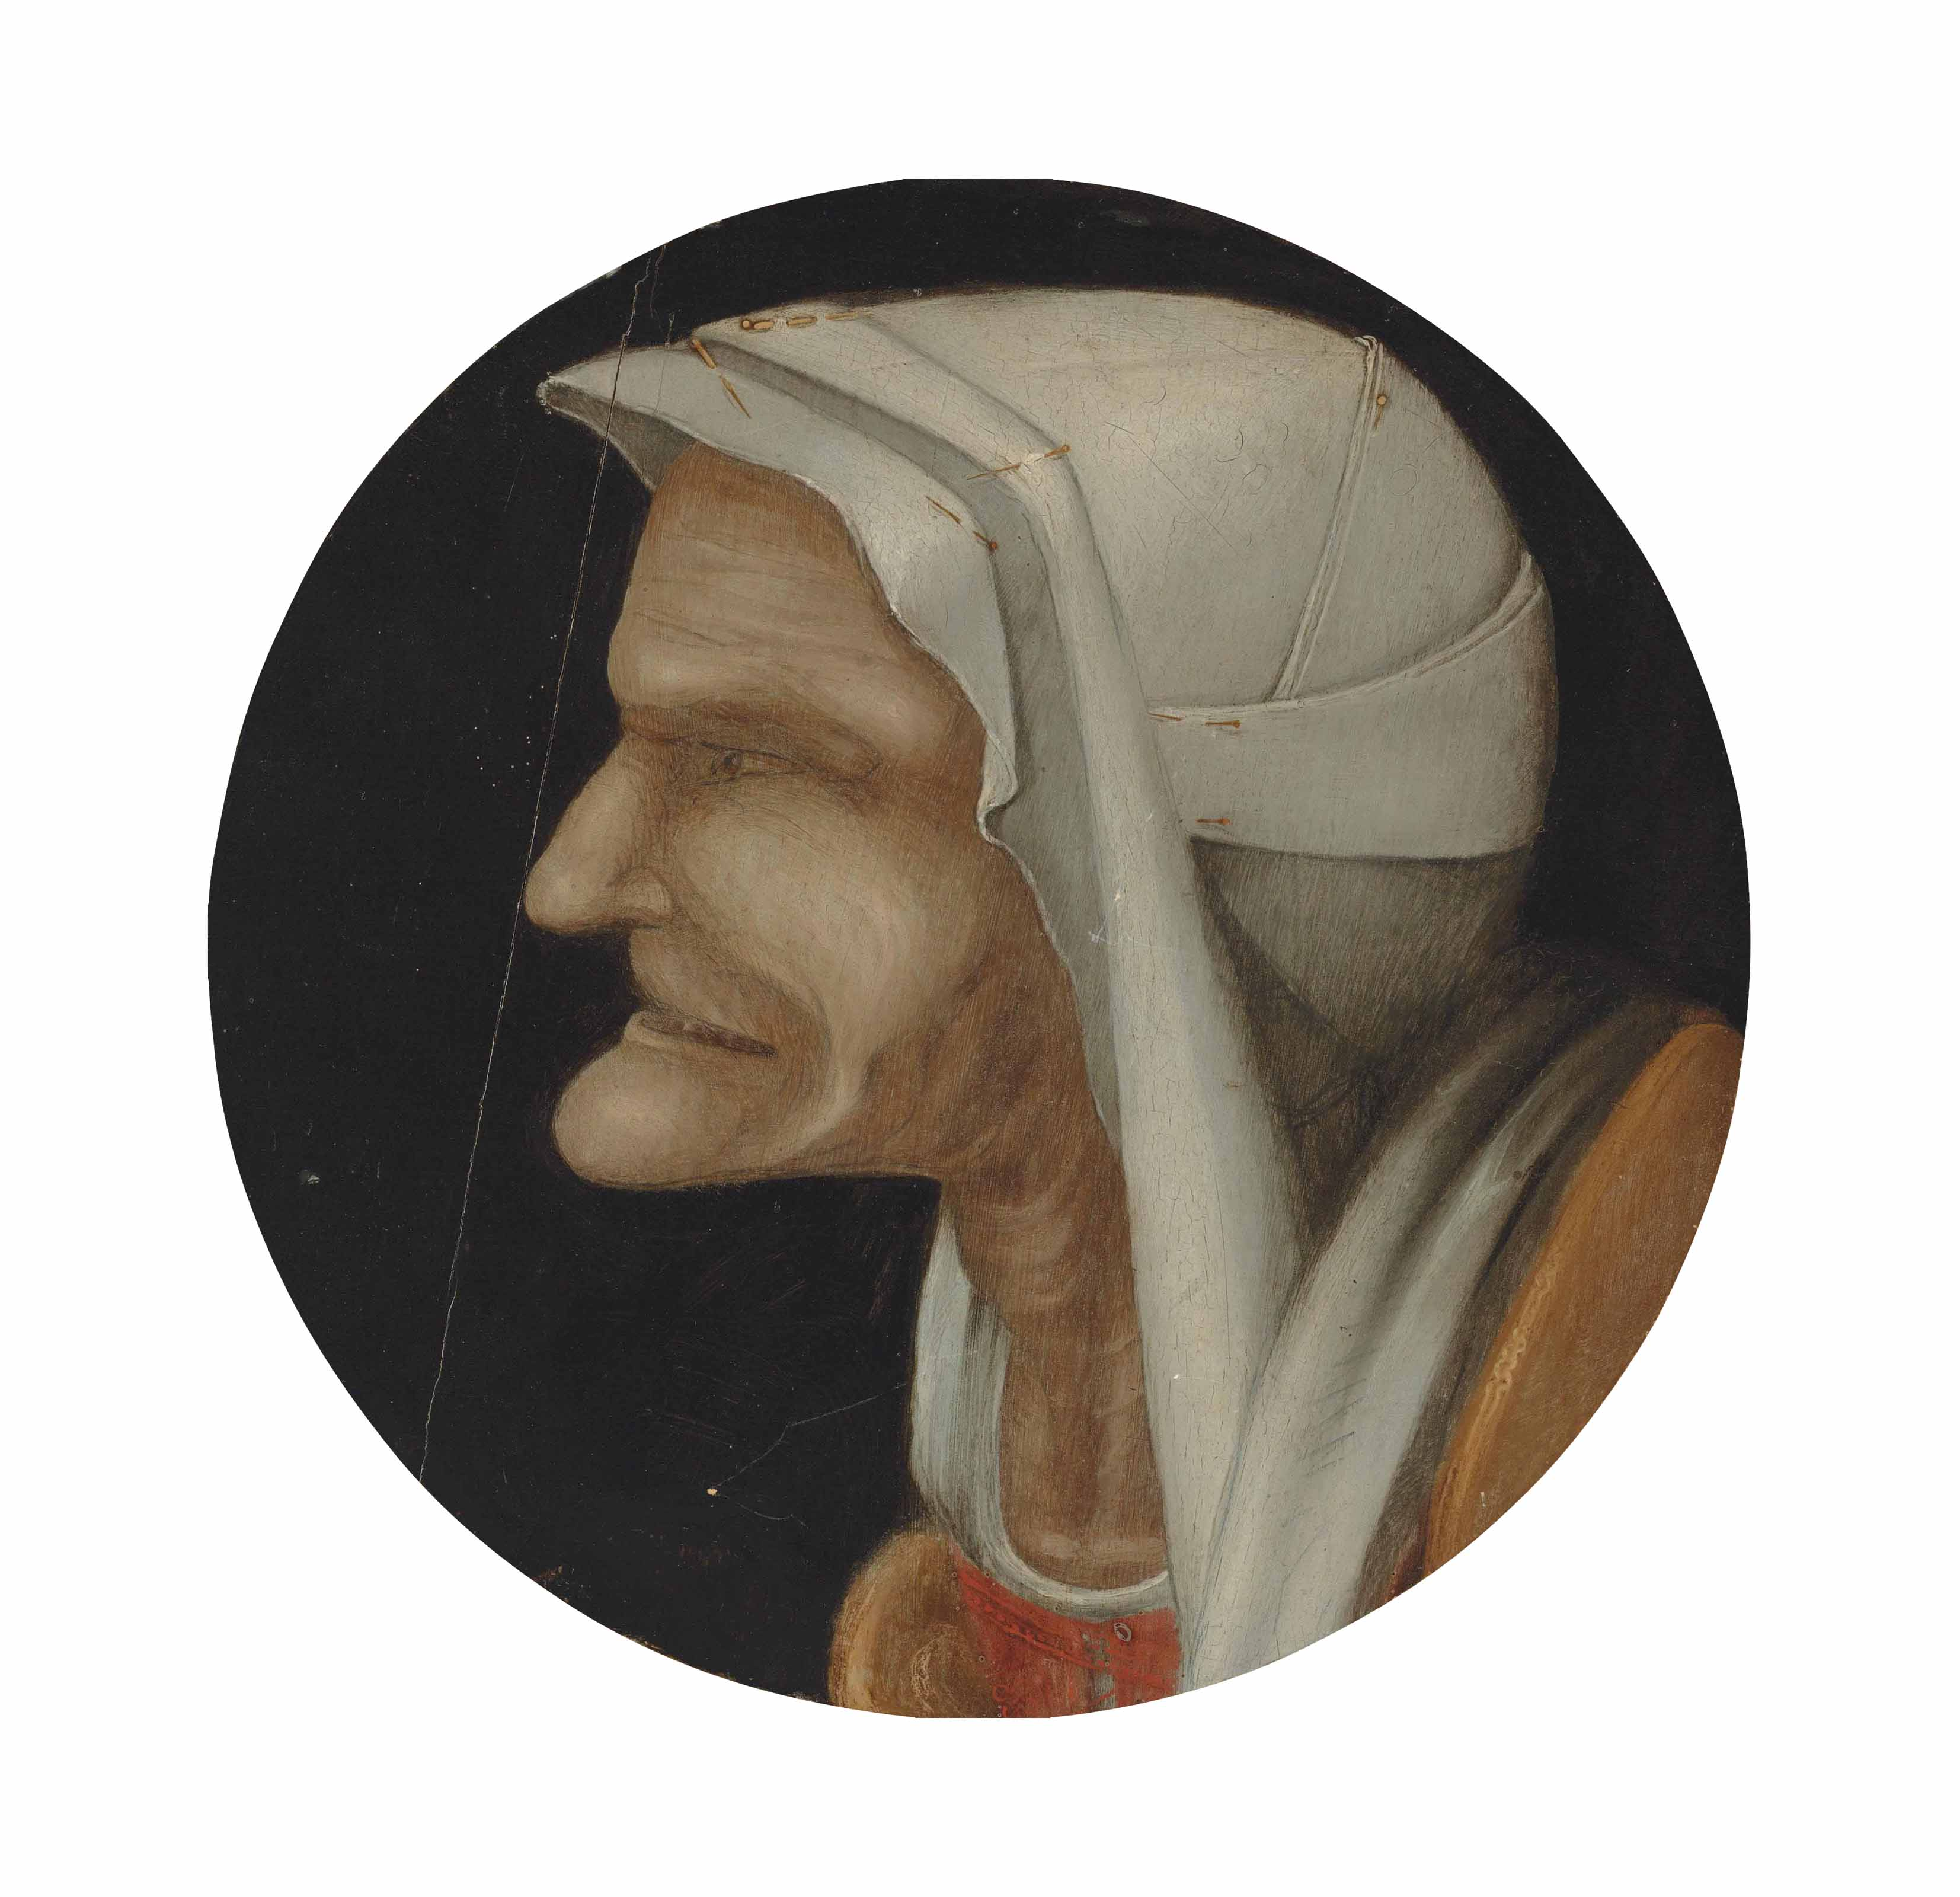 Follower of Pieter Breughel II